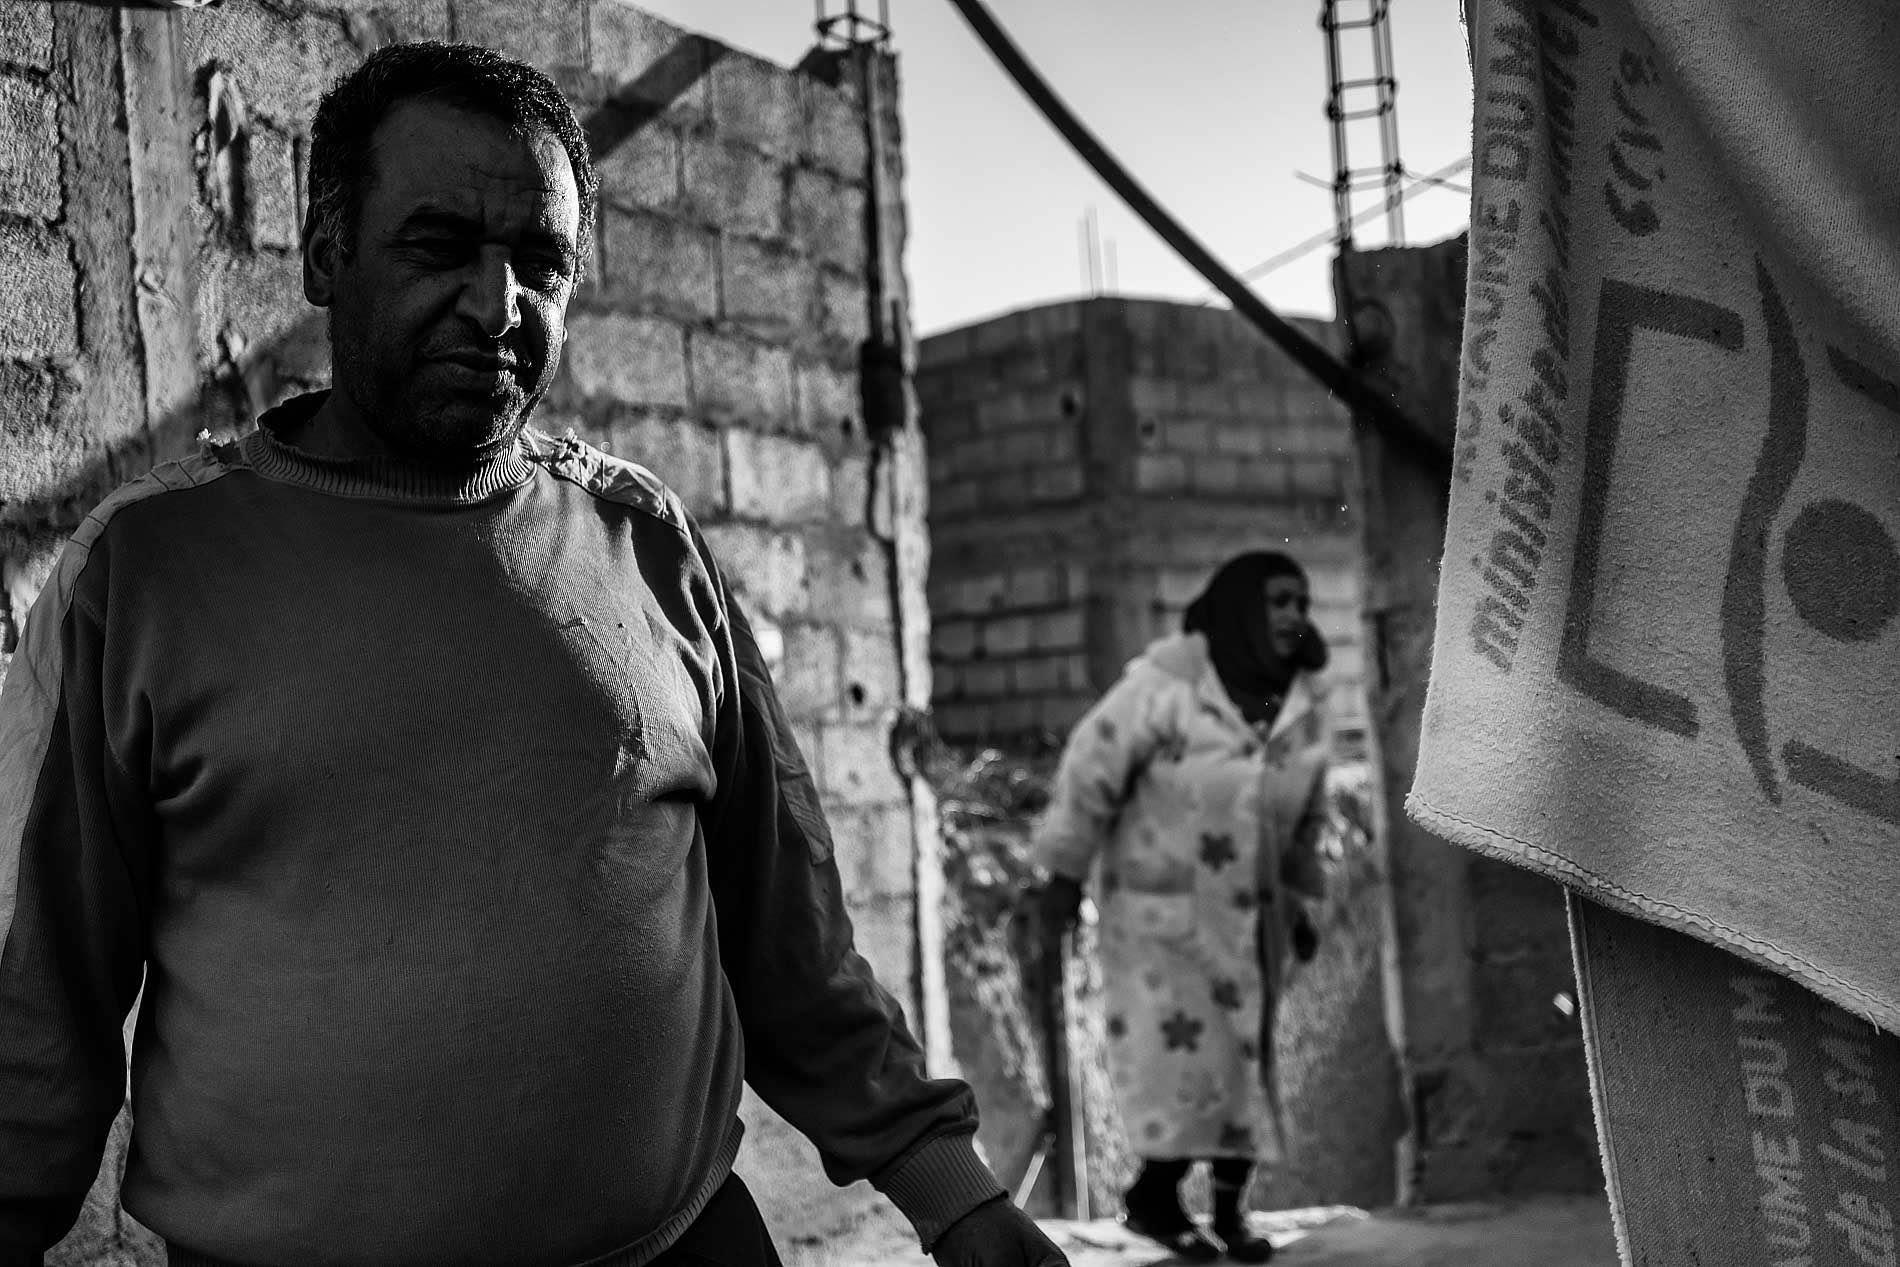 reportage_fotografie_marrakech_martinfrick-0562